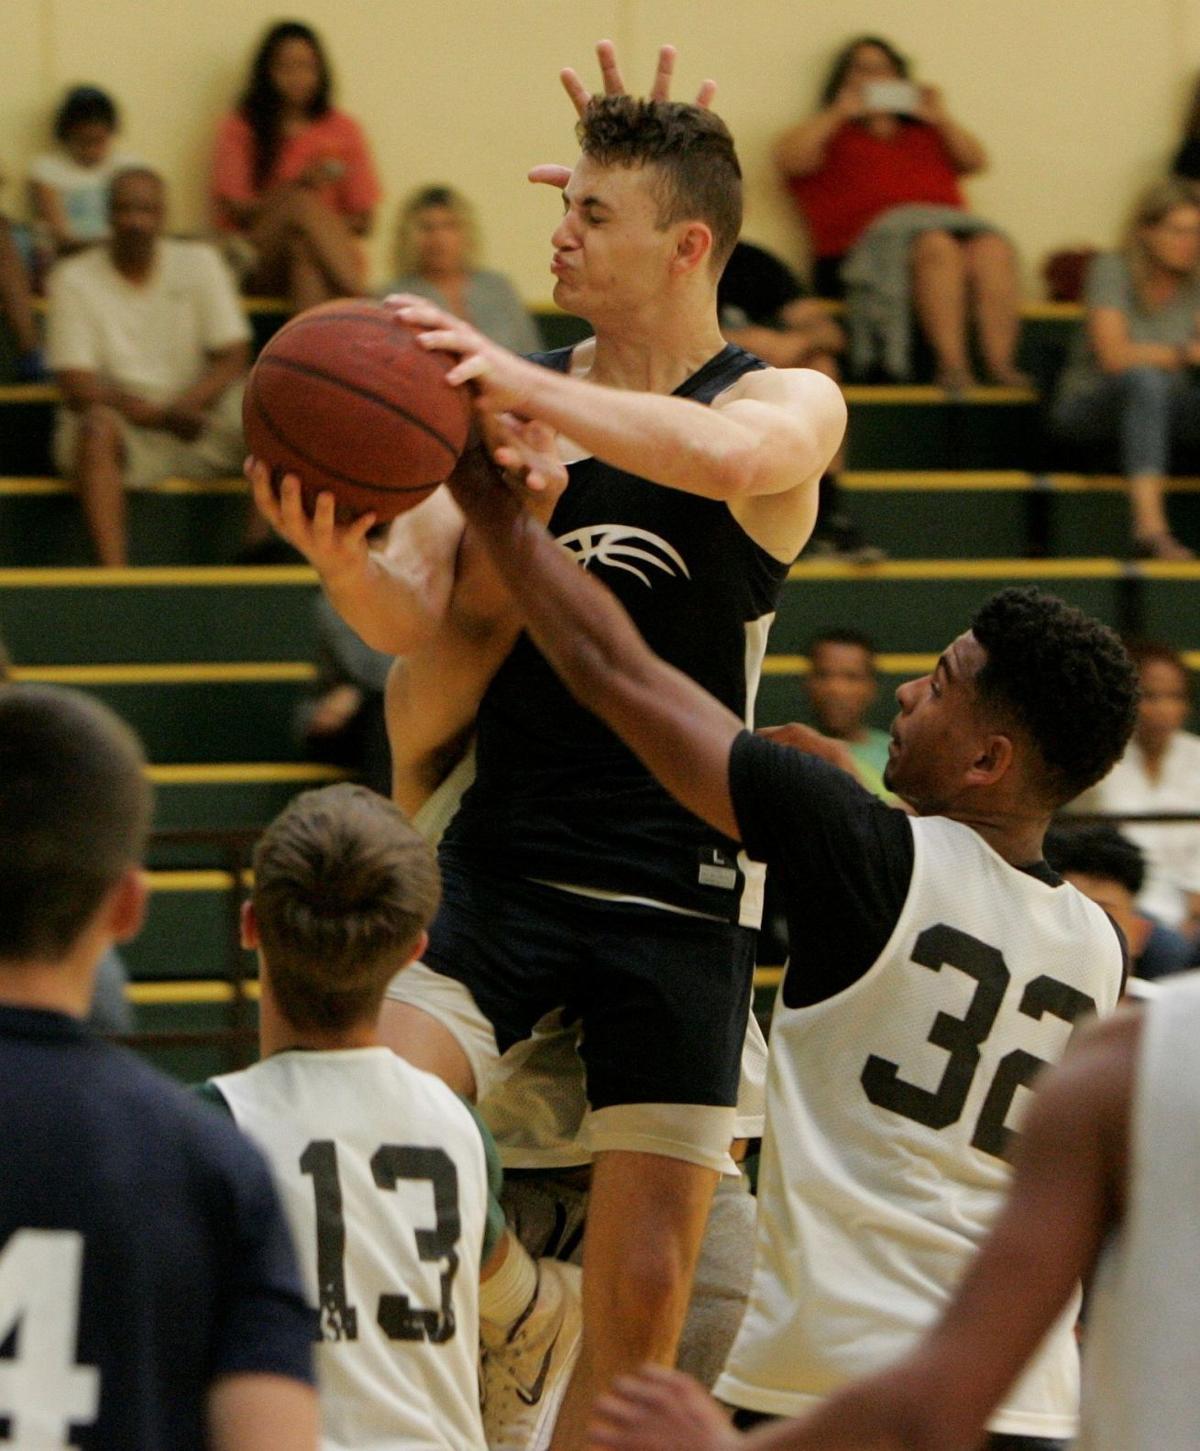 Justin-Siena boys basketball